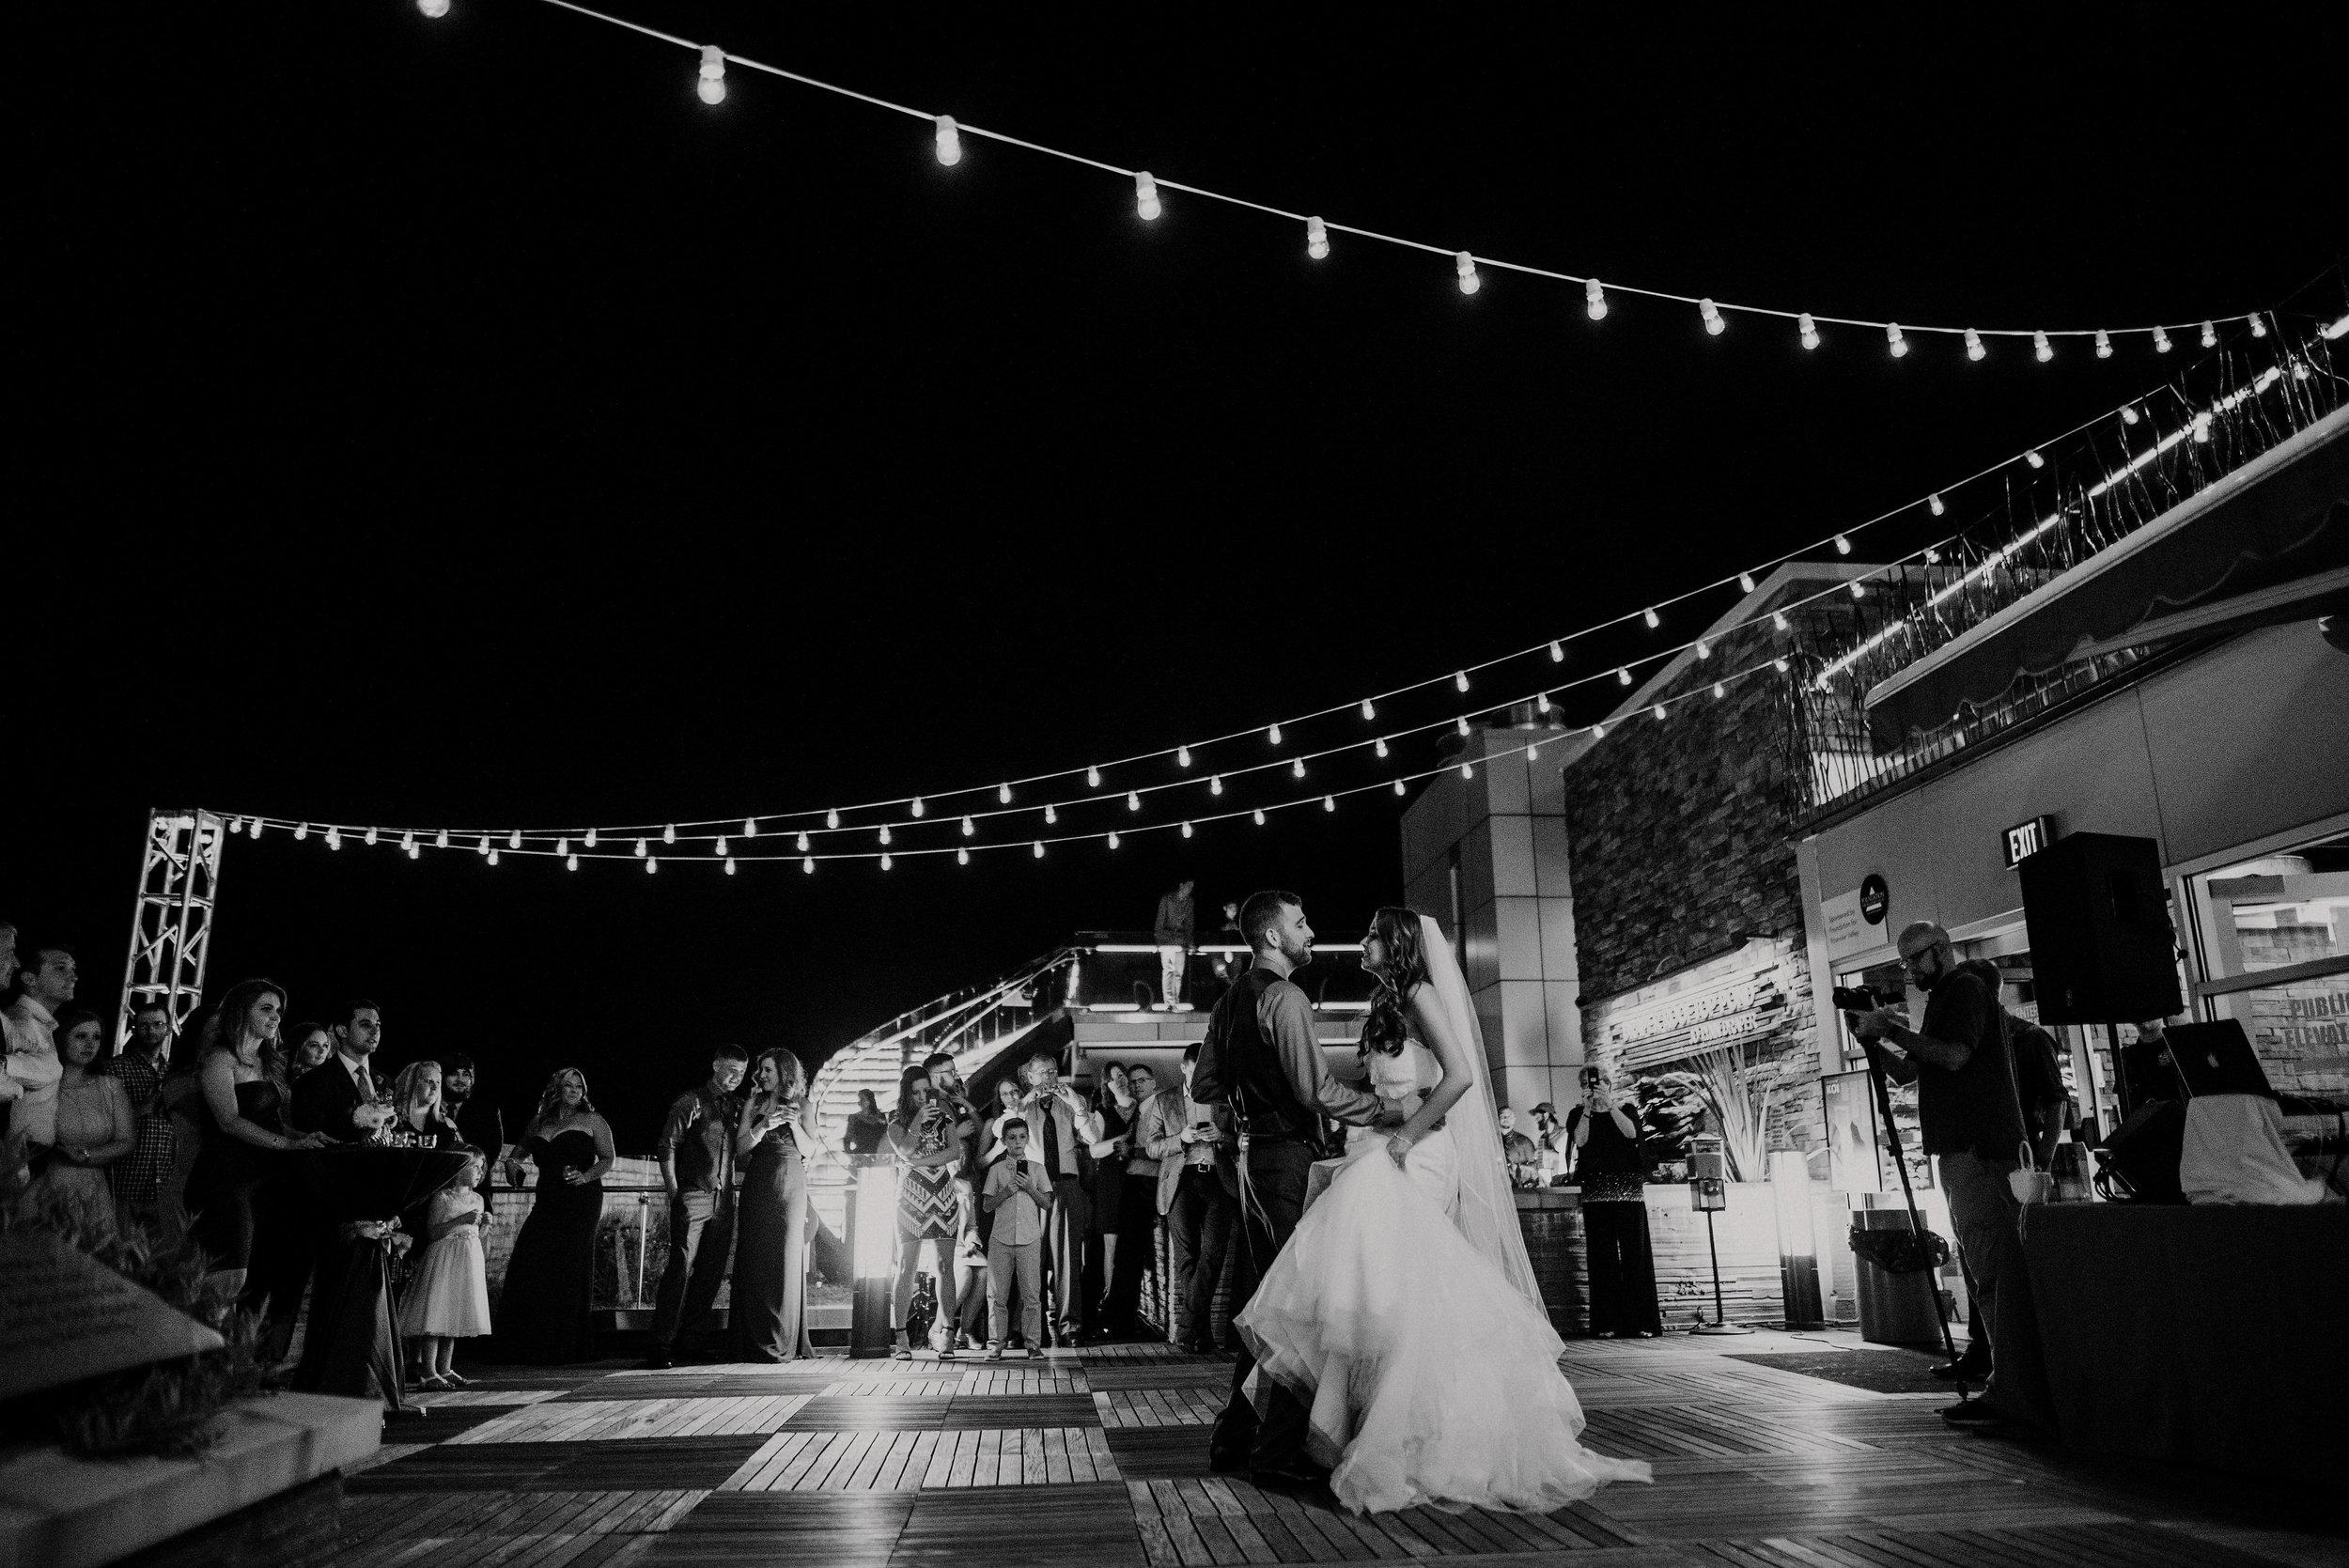 rooftop-wedding-center-in-the-square-roanoke-va-3417.jpg